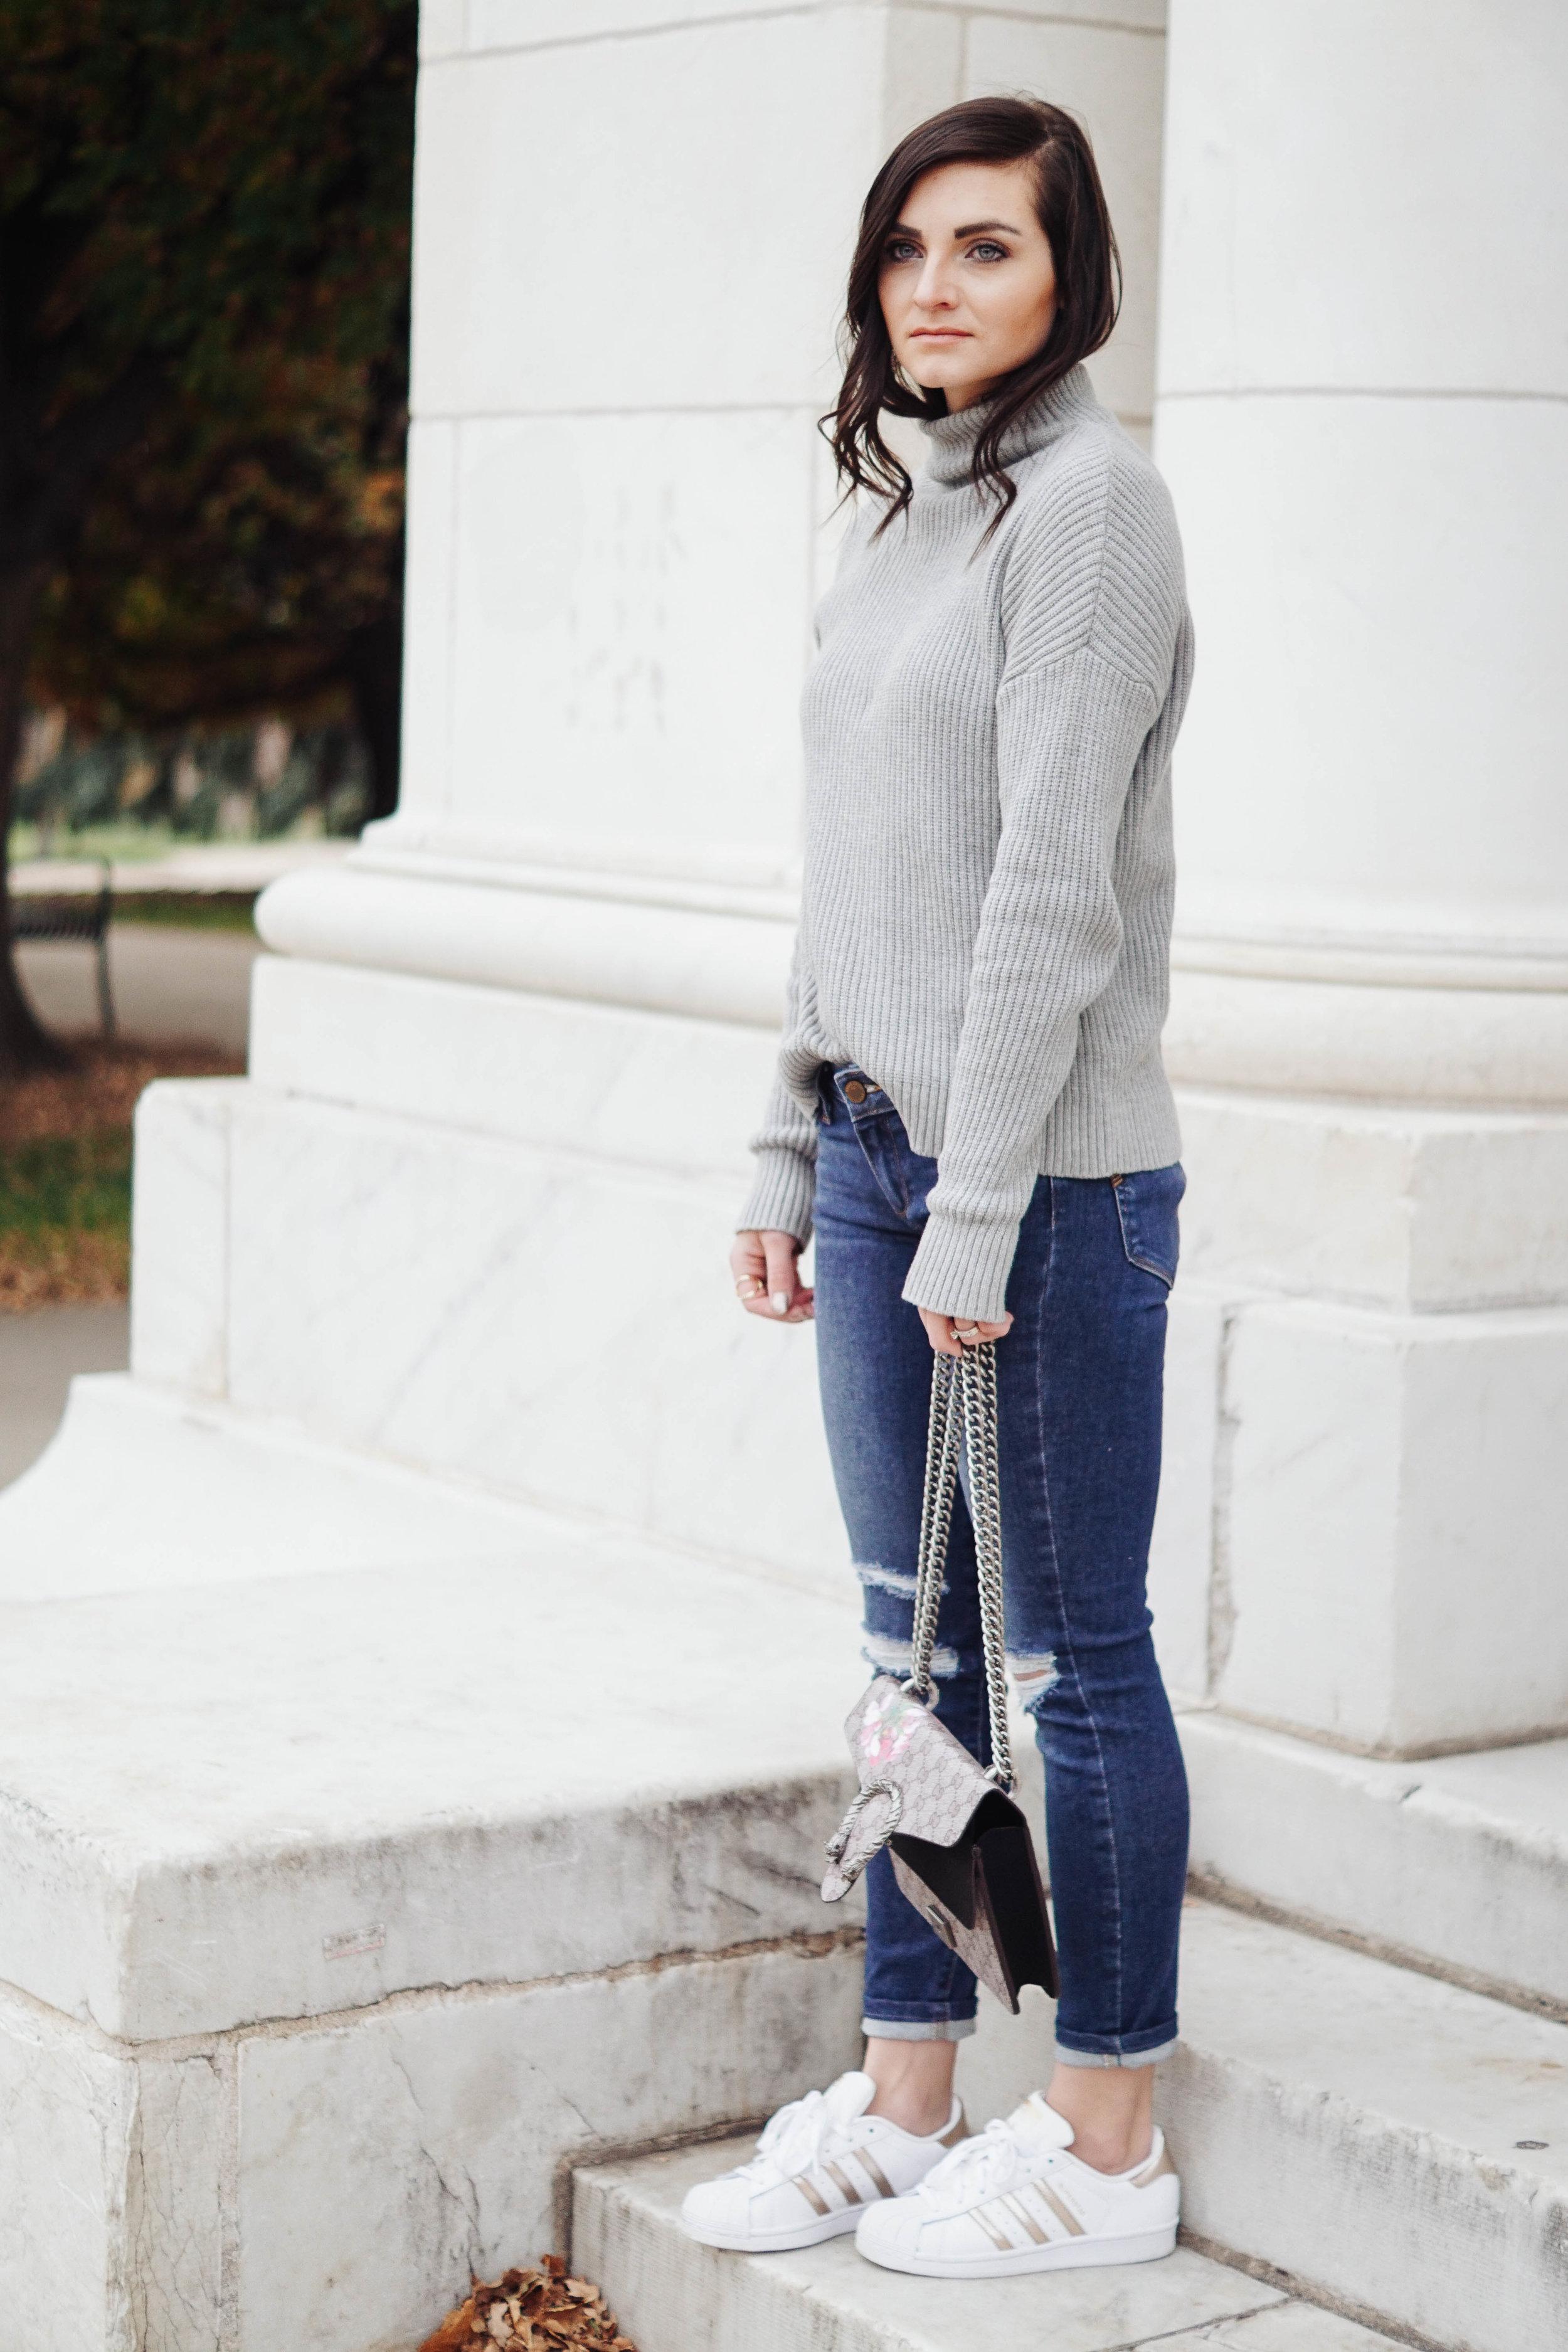 Mock Neck Sweater  //  Paige Denim , similar  HERE  //  Sneakers , similar  HERE  //  Bag